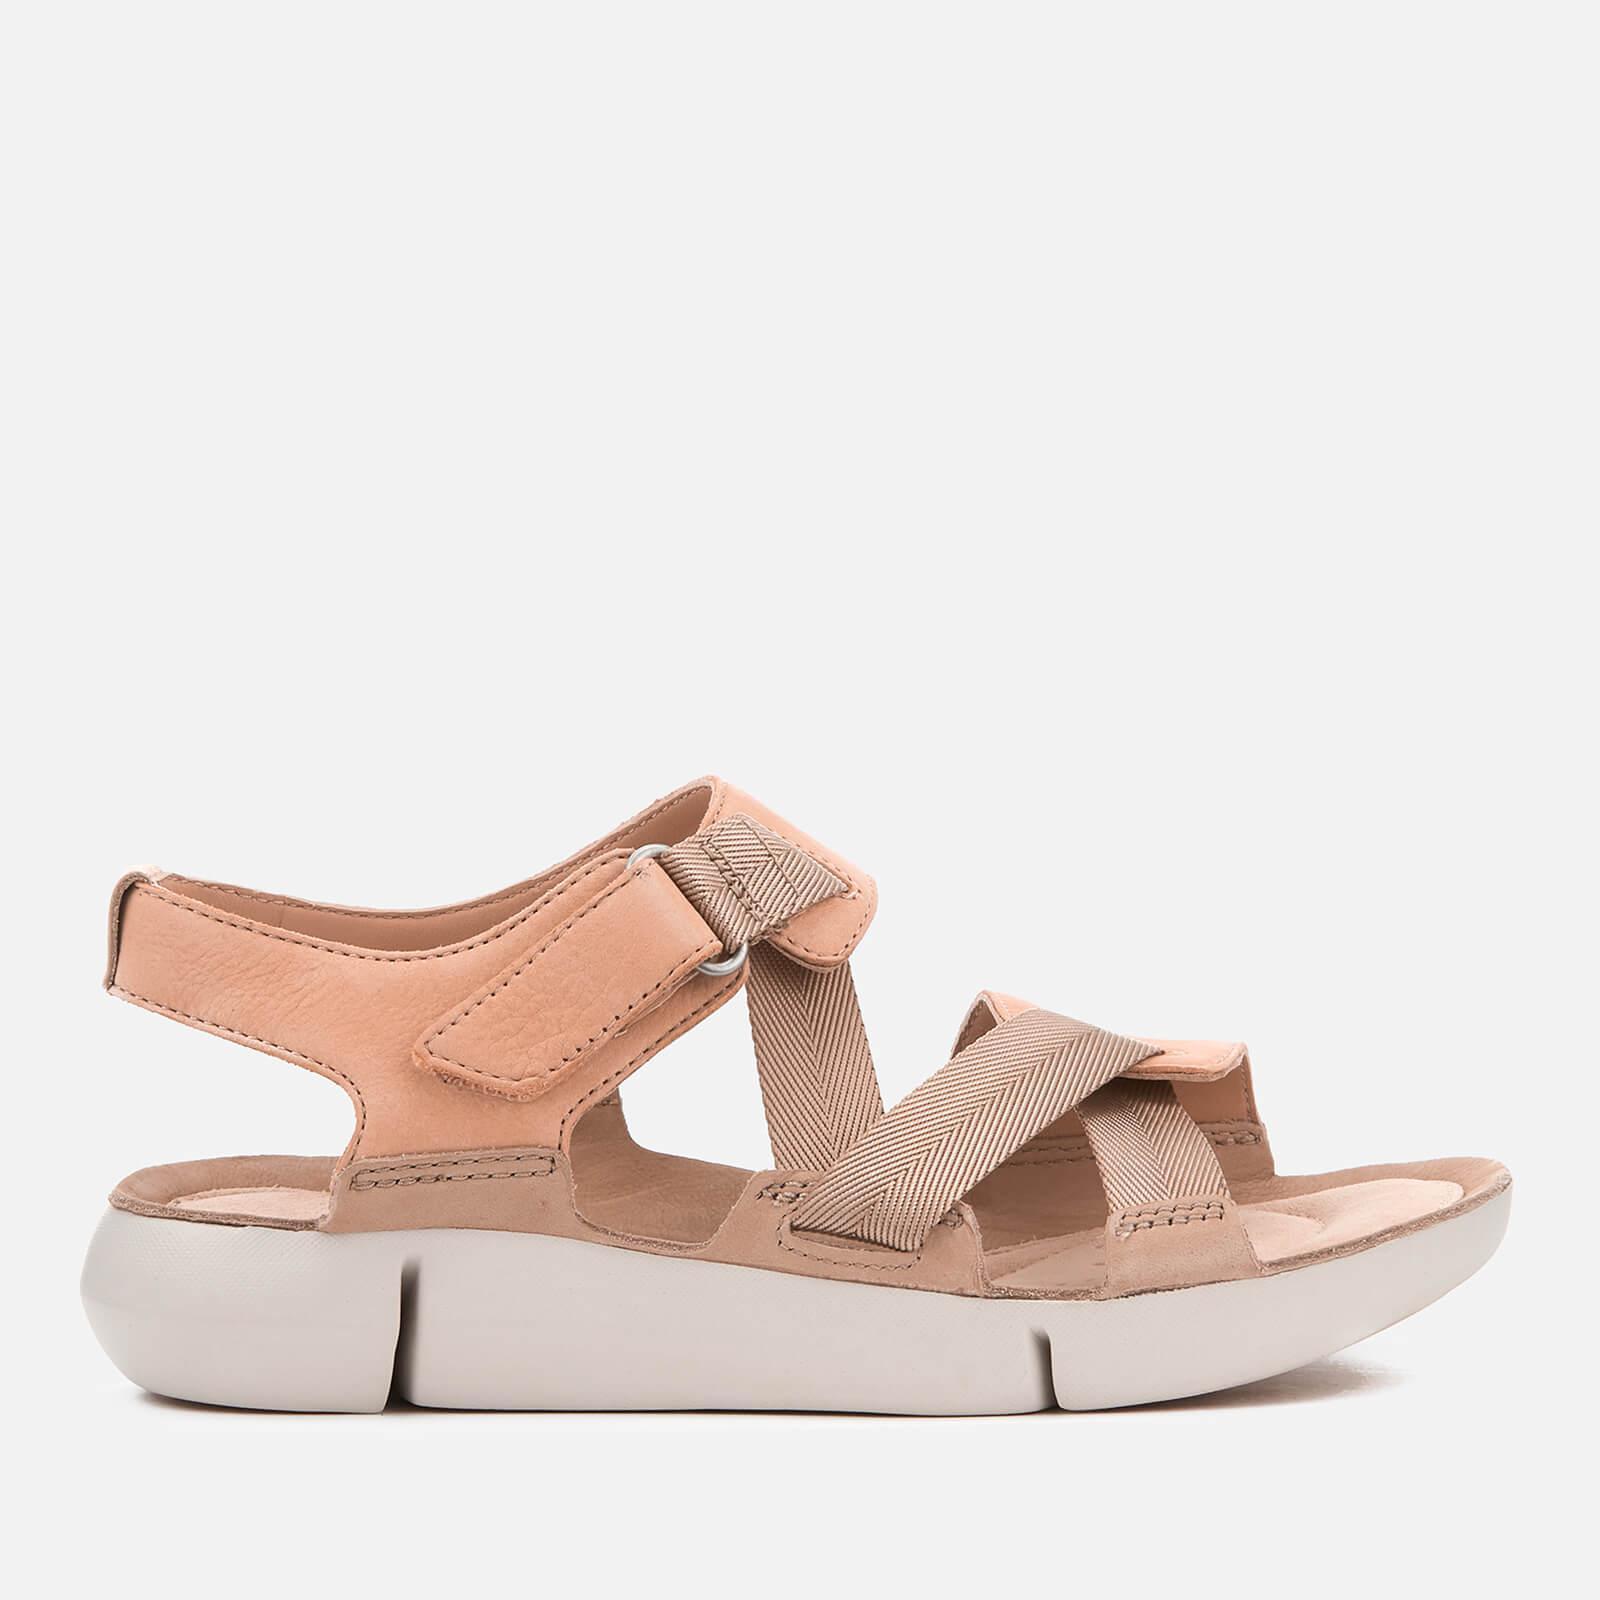 7485cfbc54c Lyst - Clarks Tri Clover Strappy Sport Sandals in Pink